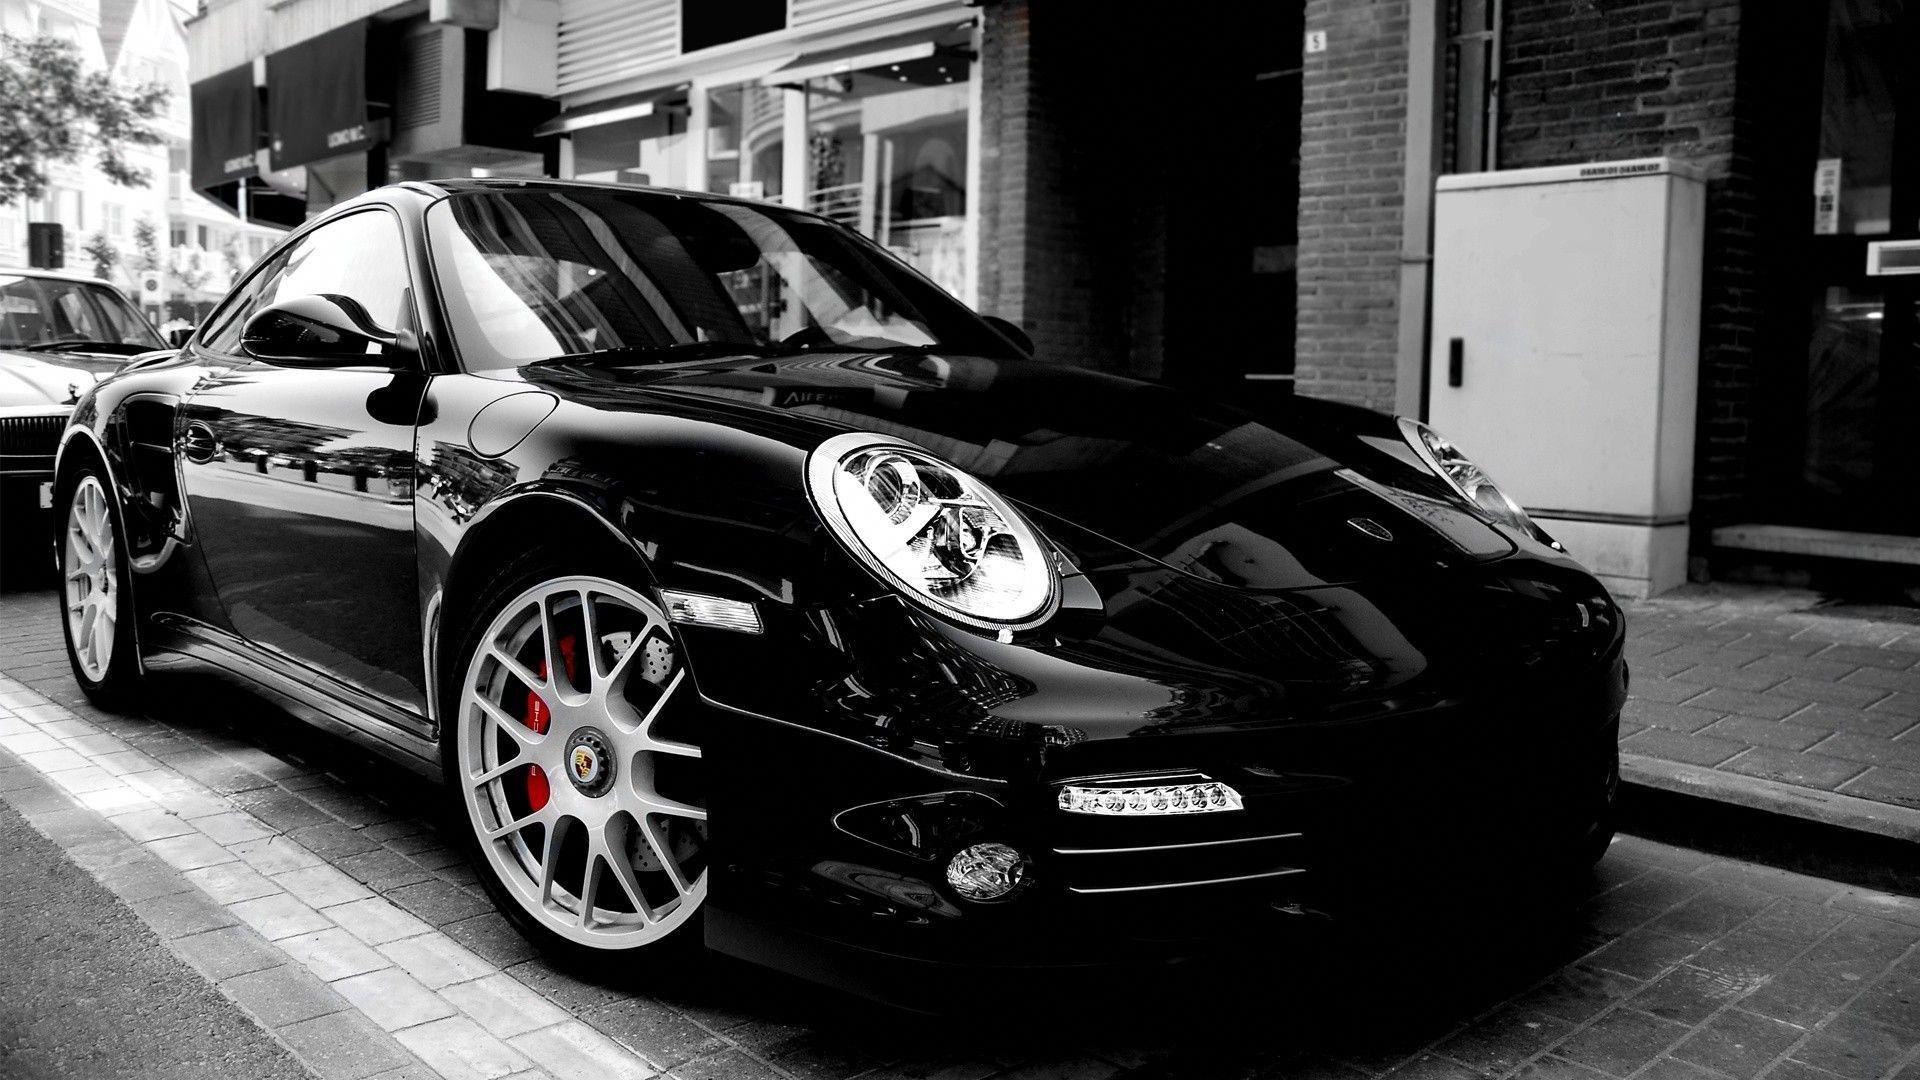 The Porsche Cayman As First Introduced In 2006 With The Gt4 Model Being Porschecaymangt4tuning Black Porsche Porsche 997 Turbo Porsche